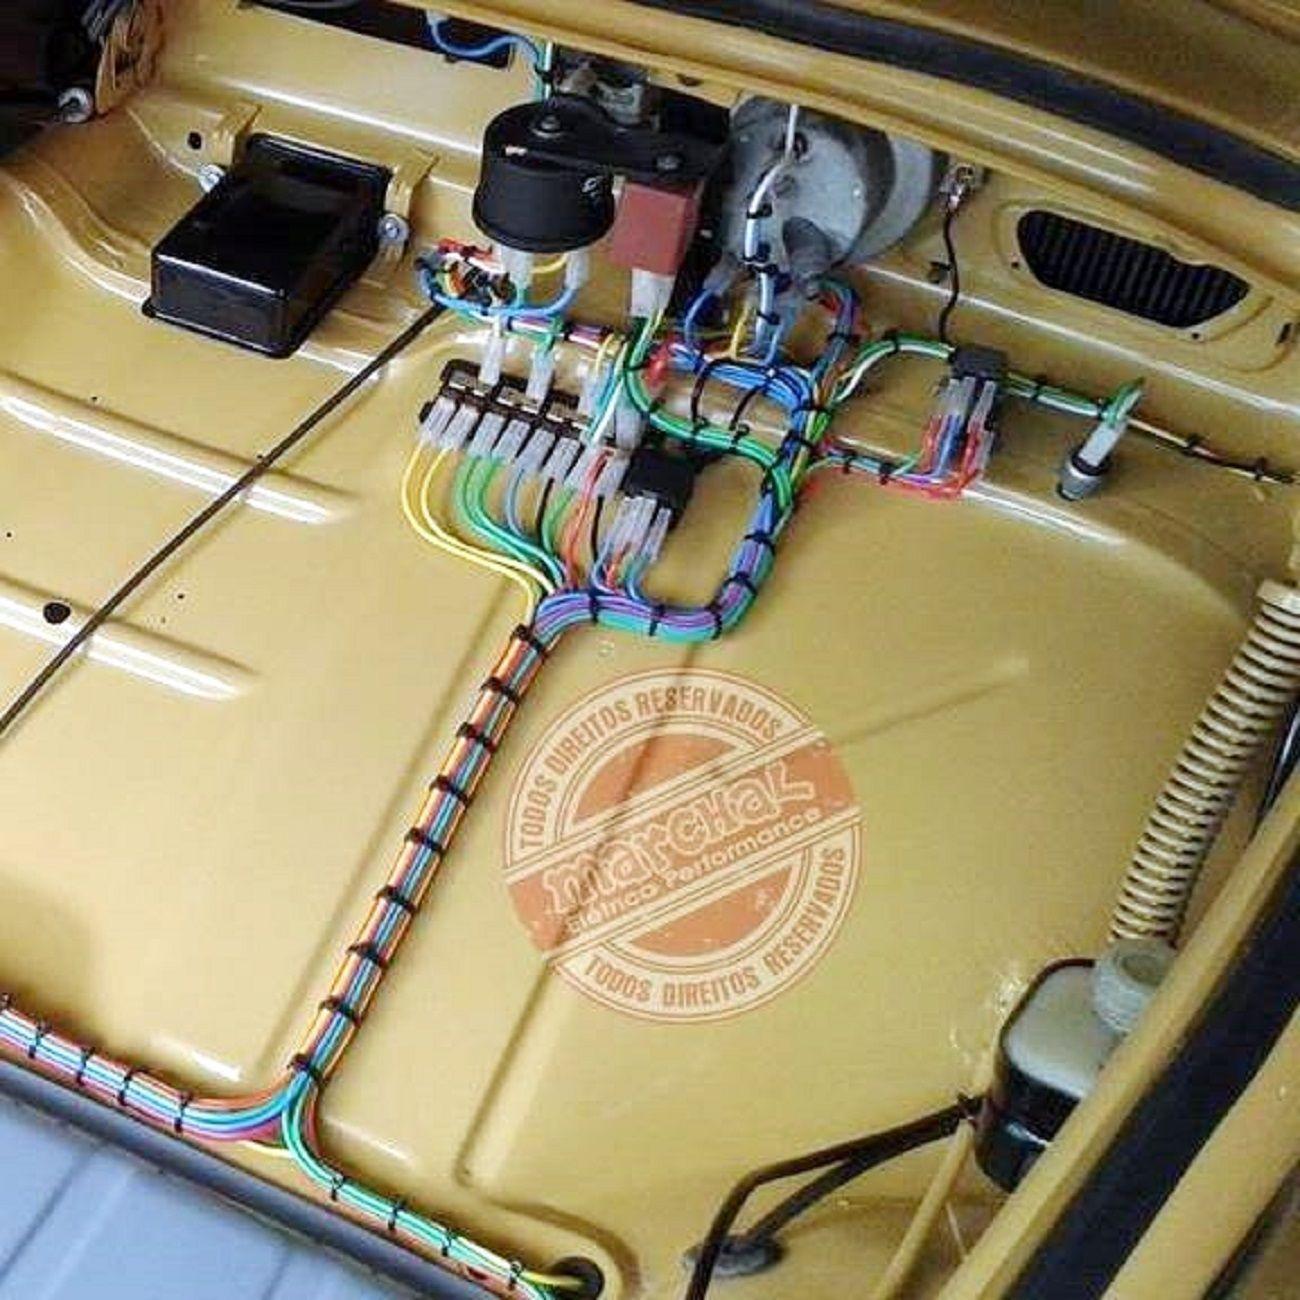 vw baja wiring pin by dawn turner on trogg vw bug  vw super beetle  vw aircooled  vw bug  vw super beetle  vw